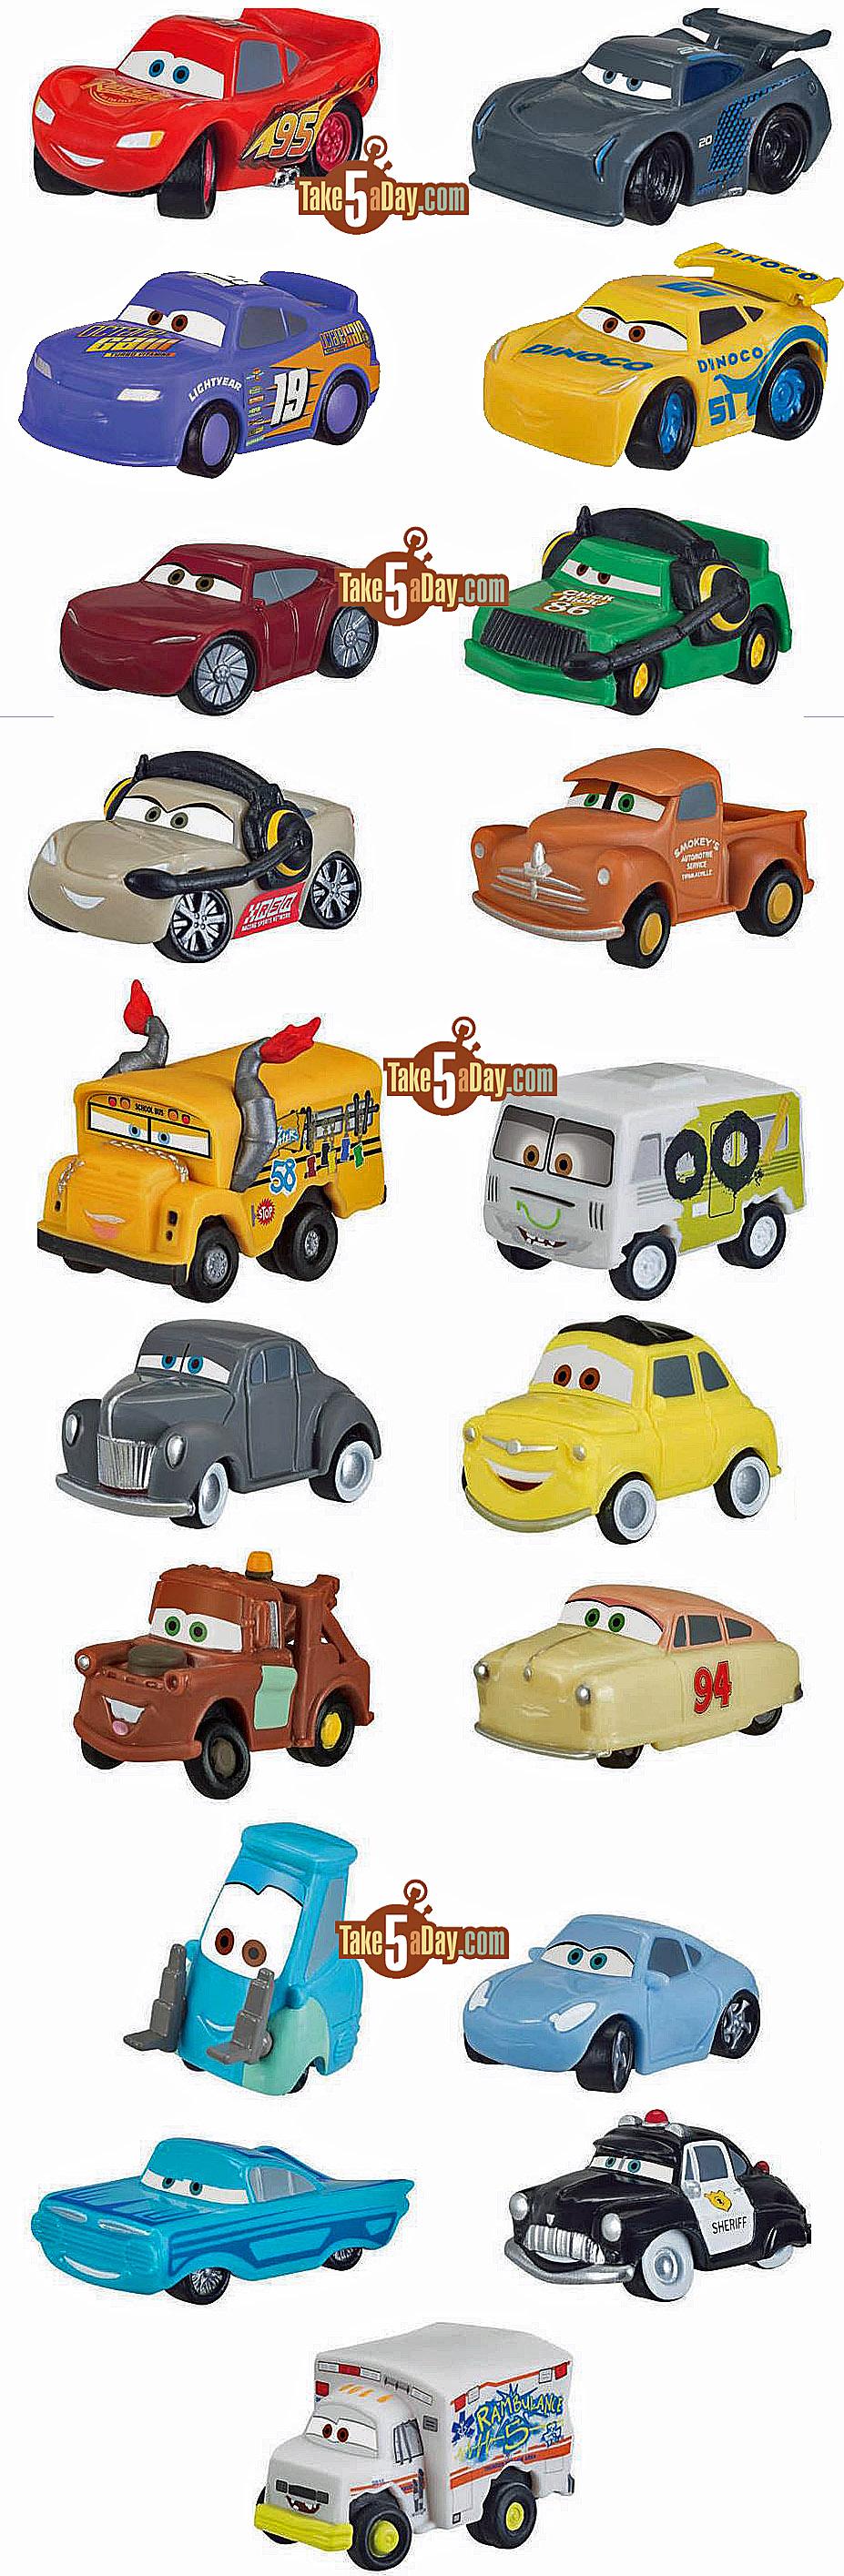 Disney Pixar Cars 3 blind bag Lightning McQueen